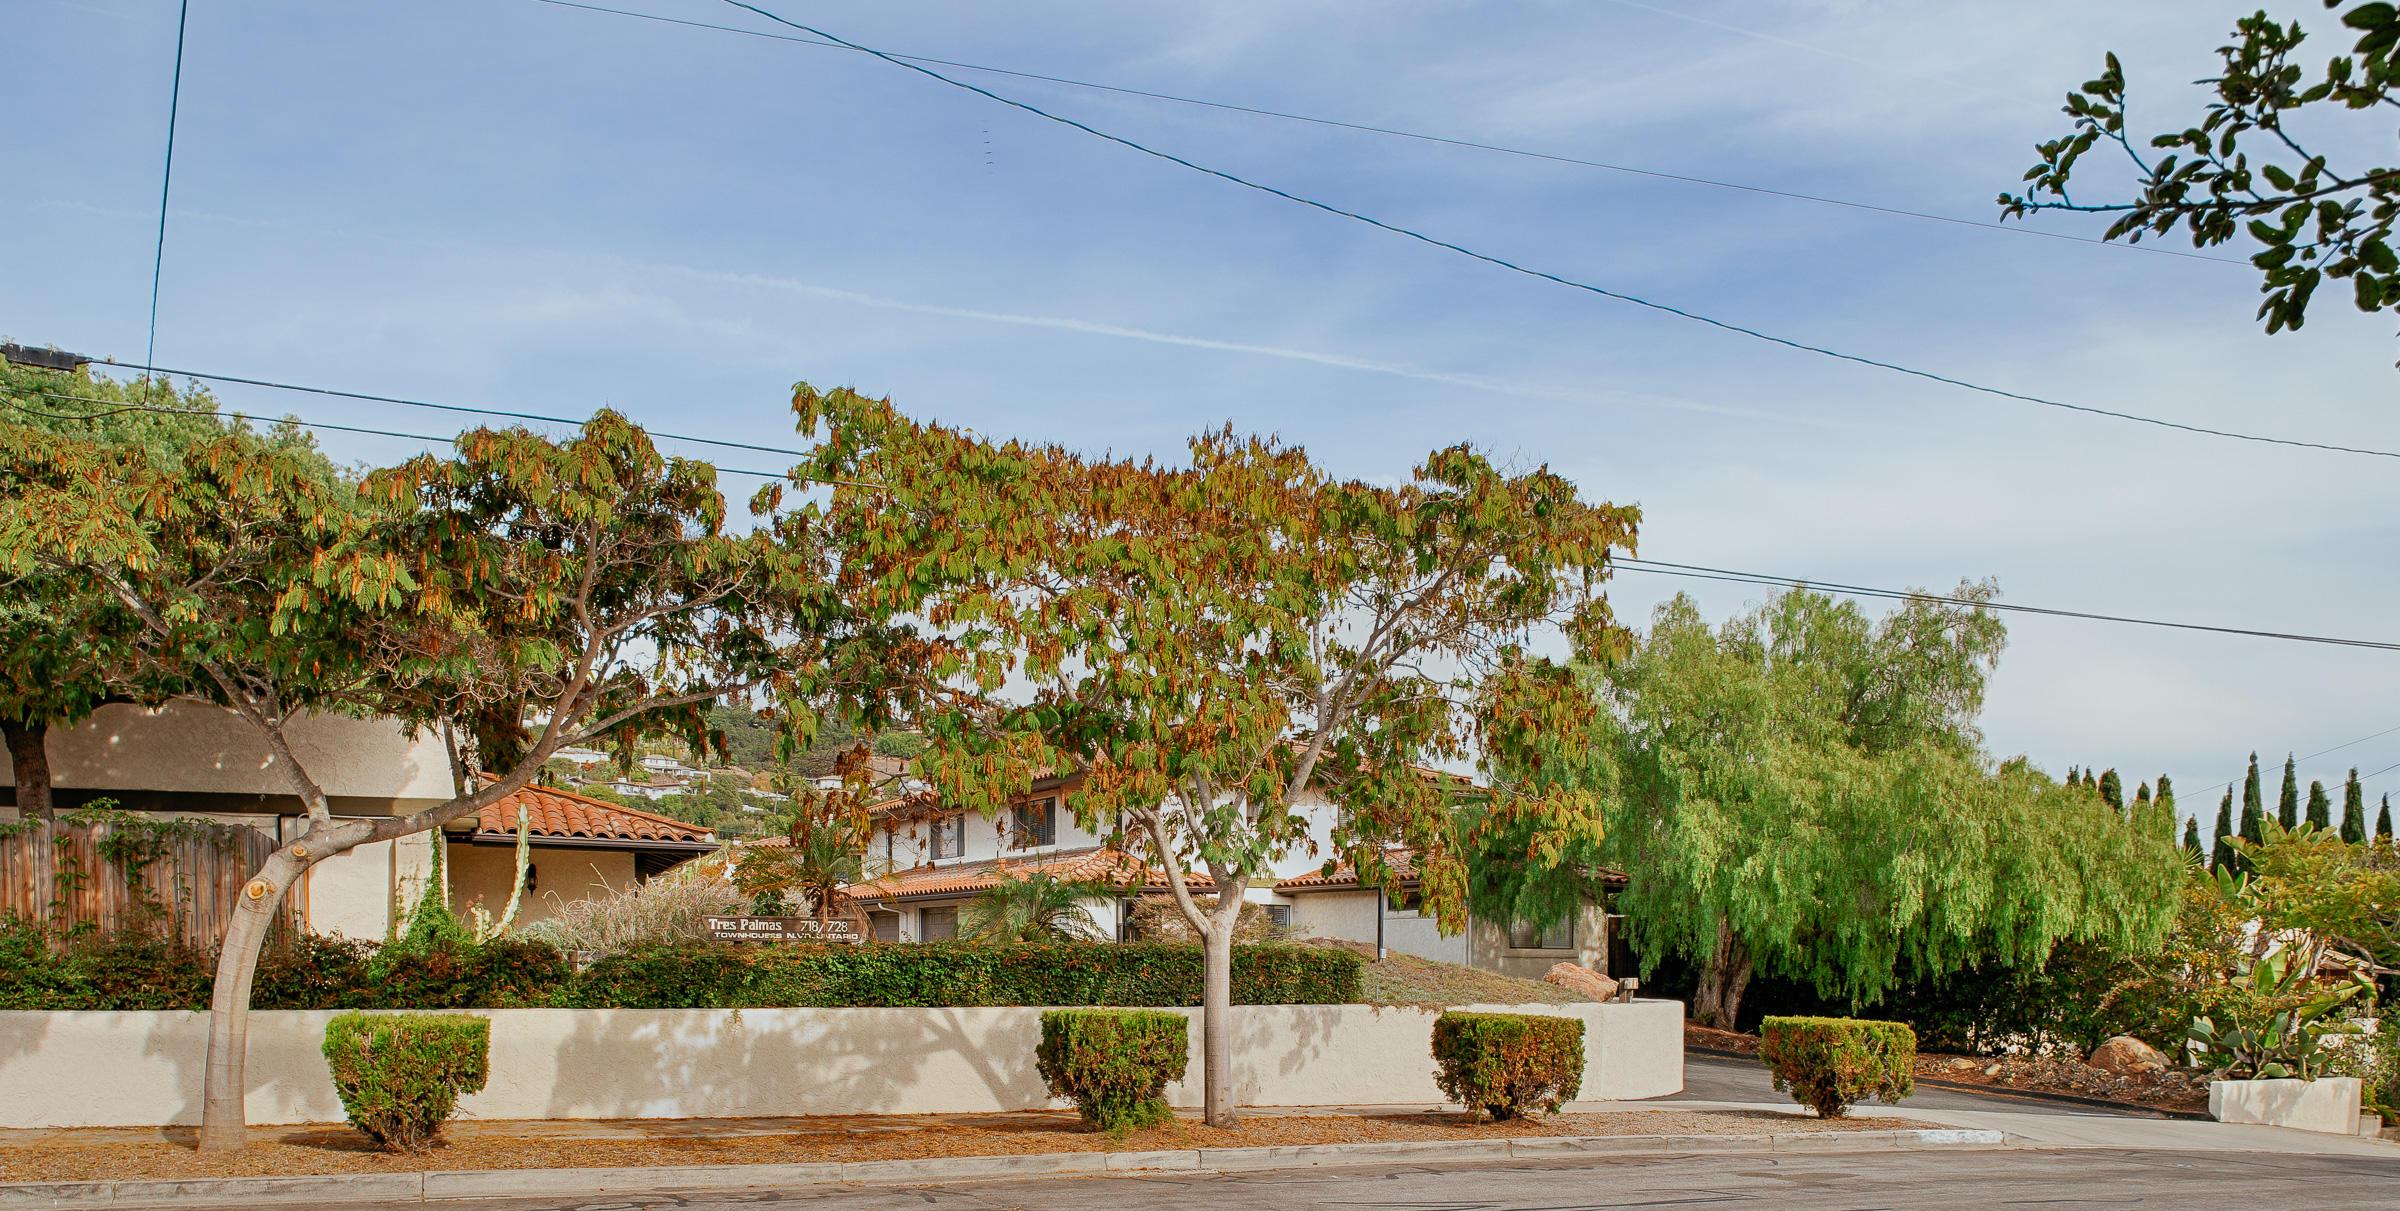 Property photo for 718 N Voluntario St Santa Barbara, California 93103 - 18-4082